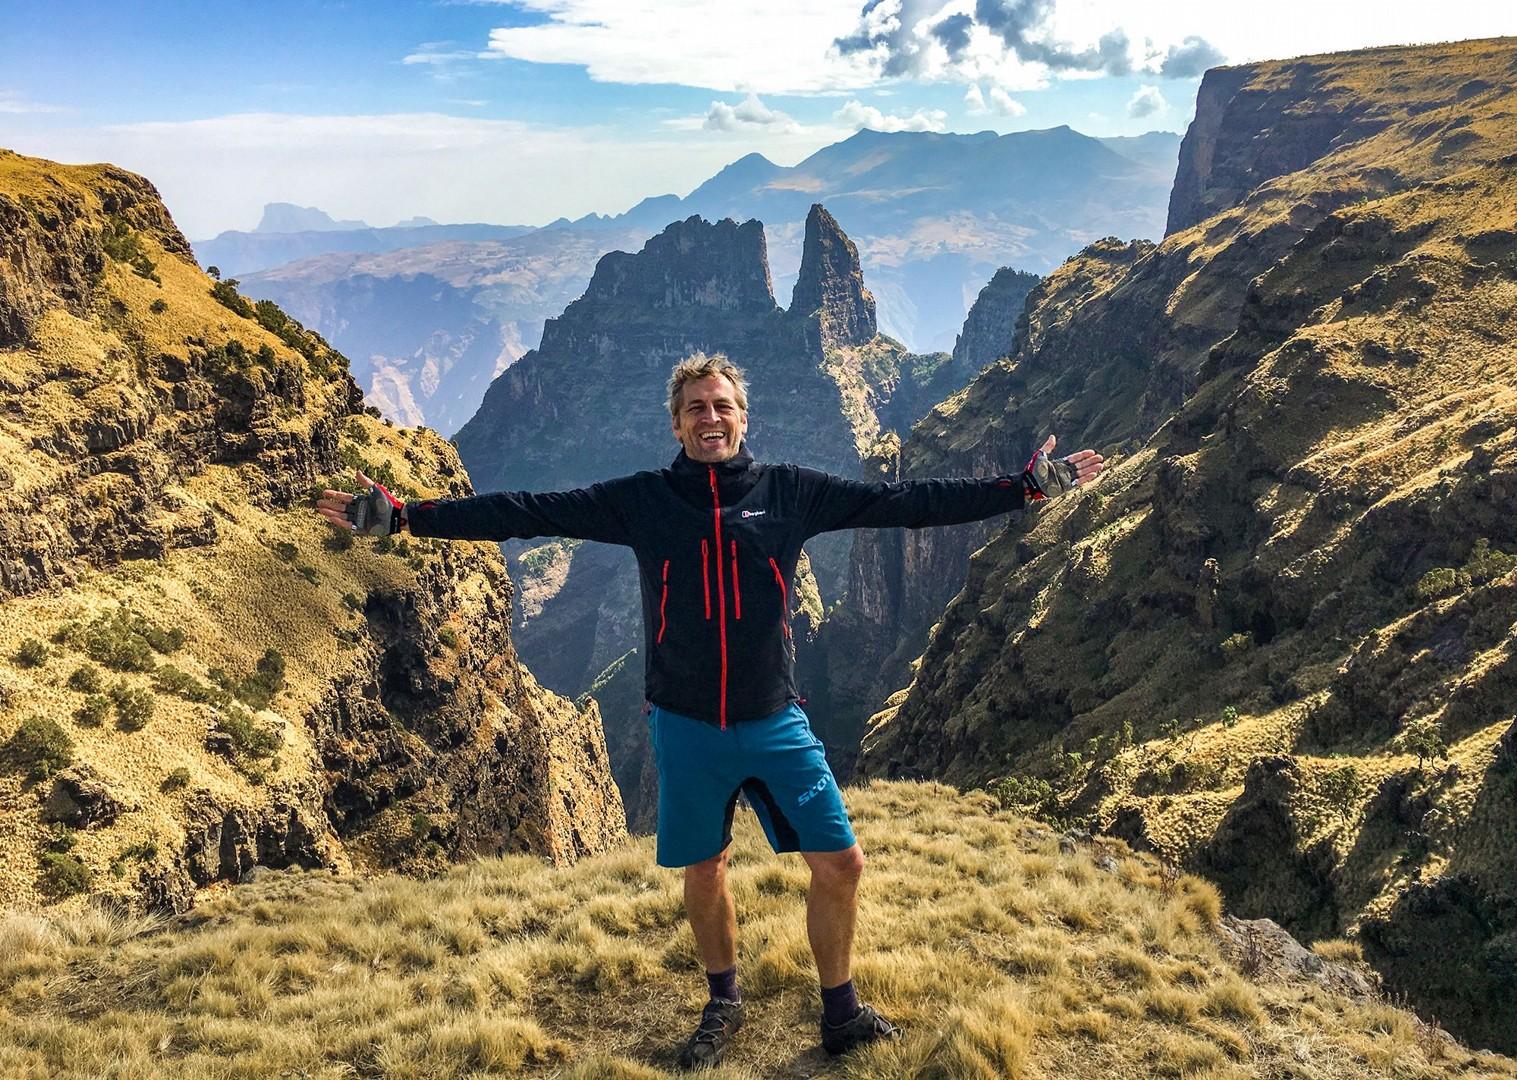 ethiopia-mountains-cycling-adventures-holidays-skedaddle.jpg - NEW! Ethiopia - Enchanting Ethiopia - Cycling Adventures